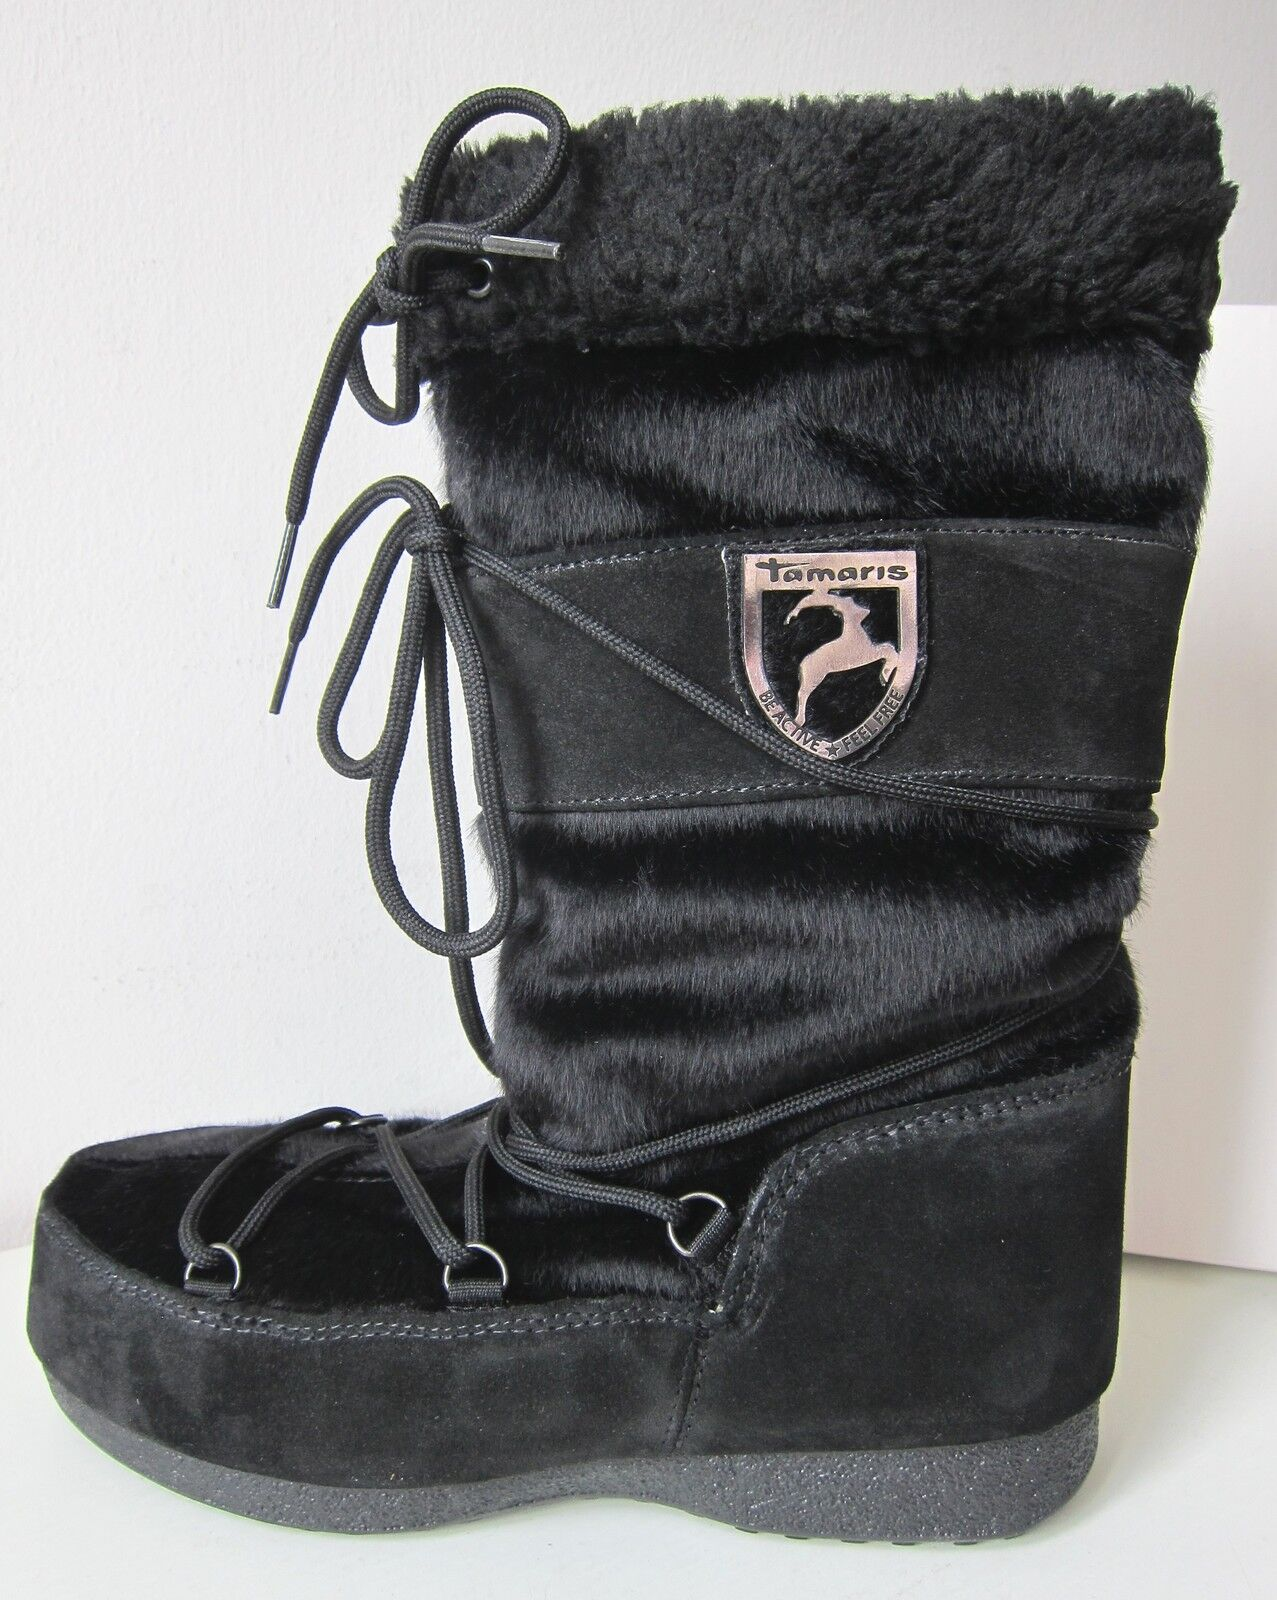 Tamaris Winter Stiefel Stiefel warm schwarz Gr. 39 schwarz Thia